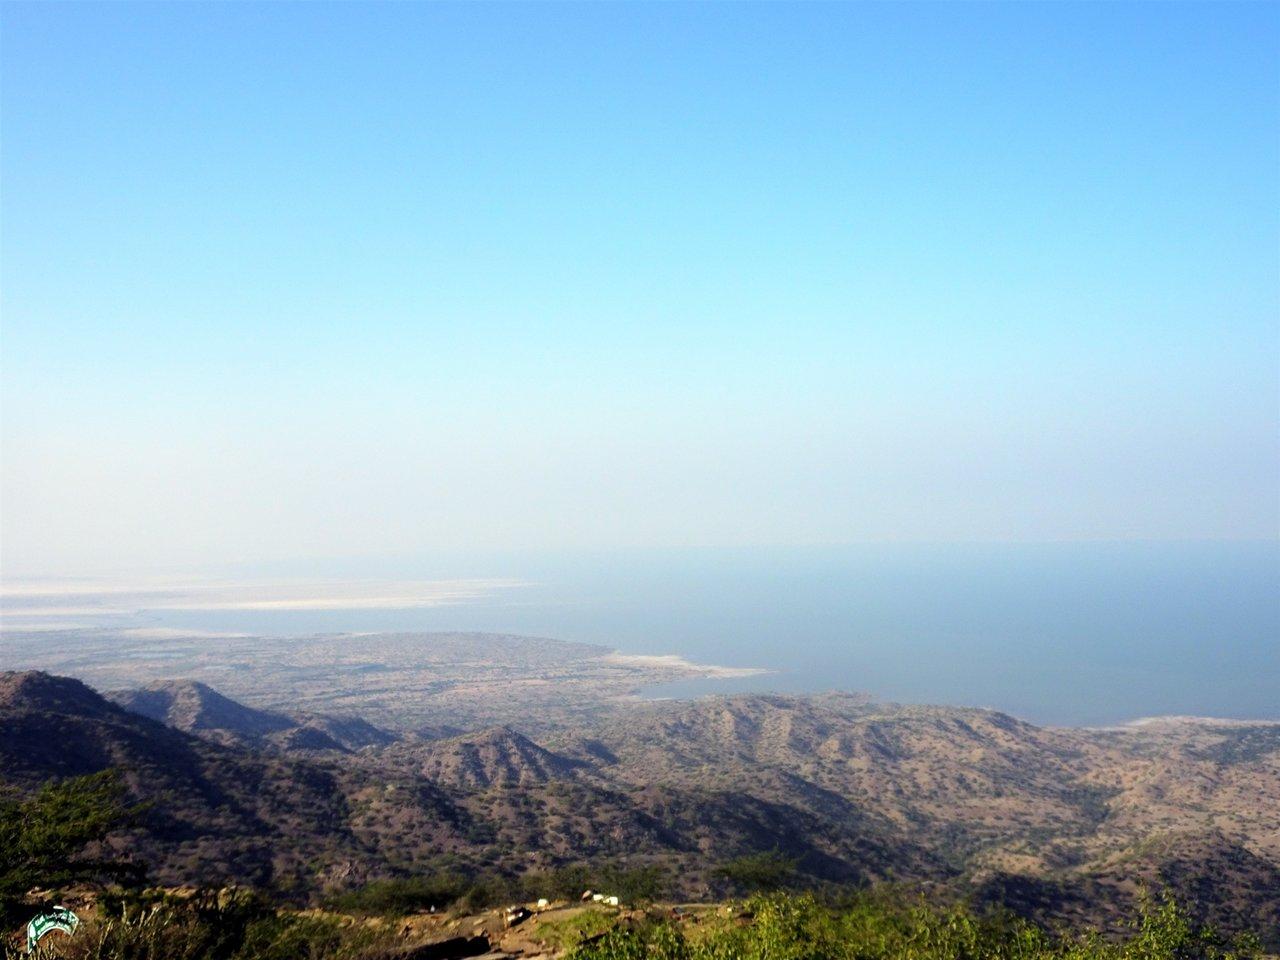 Kalo Dungar View Point